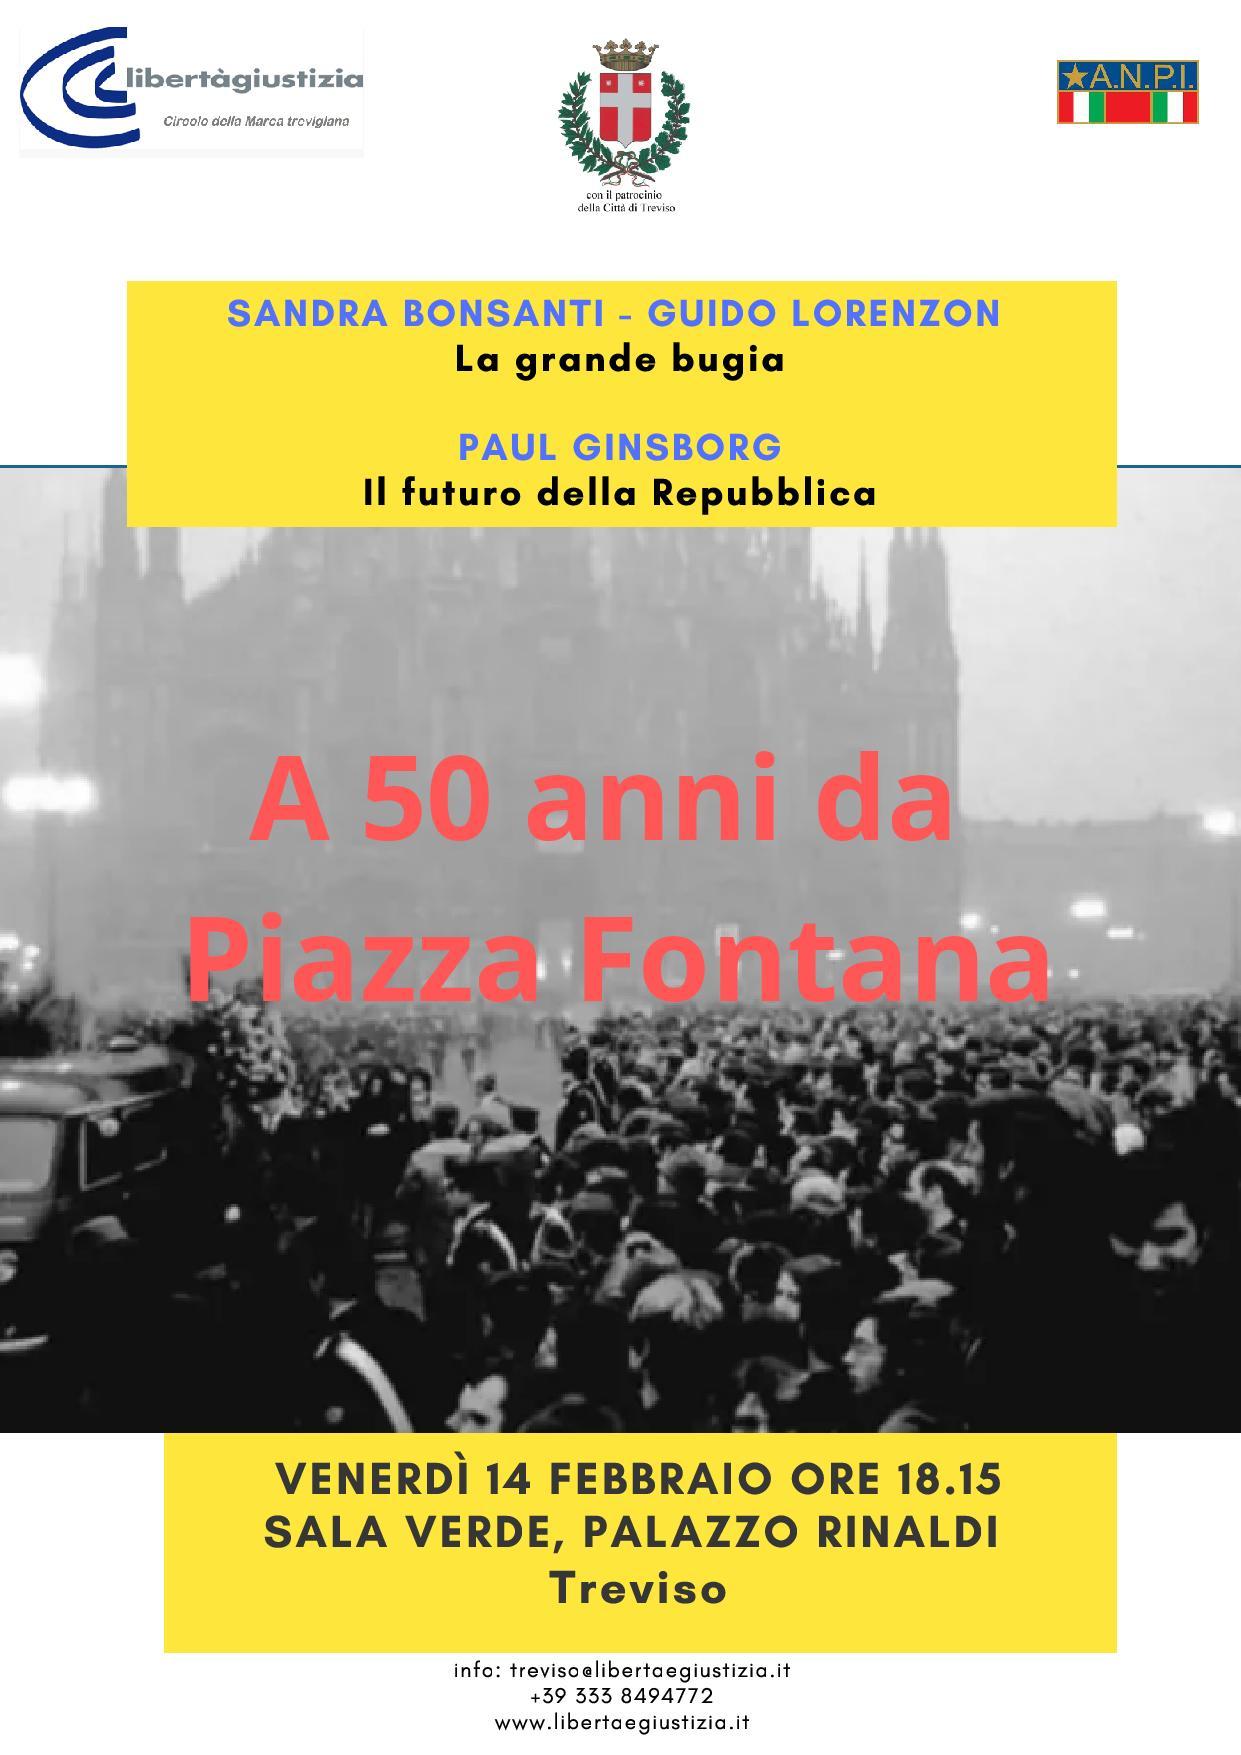 LeG_Treviso Piazza Fontana 14 febbraio-page-001